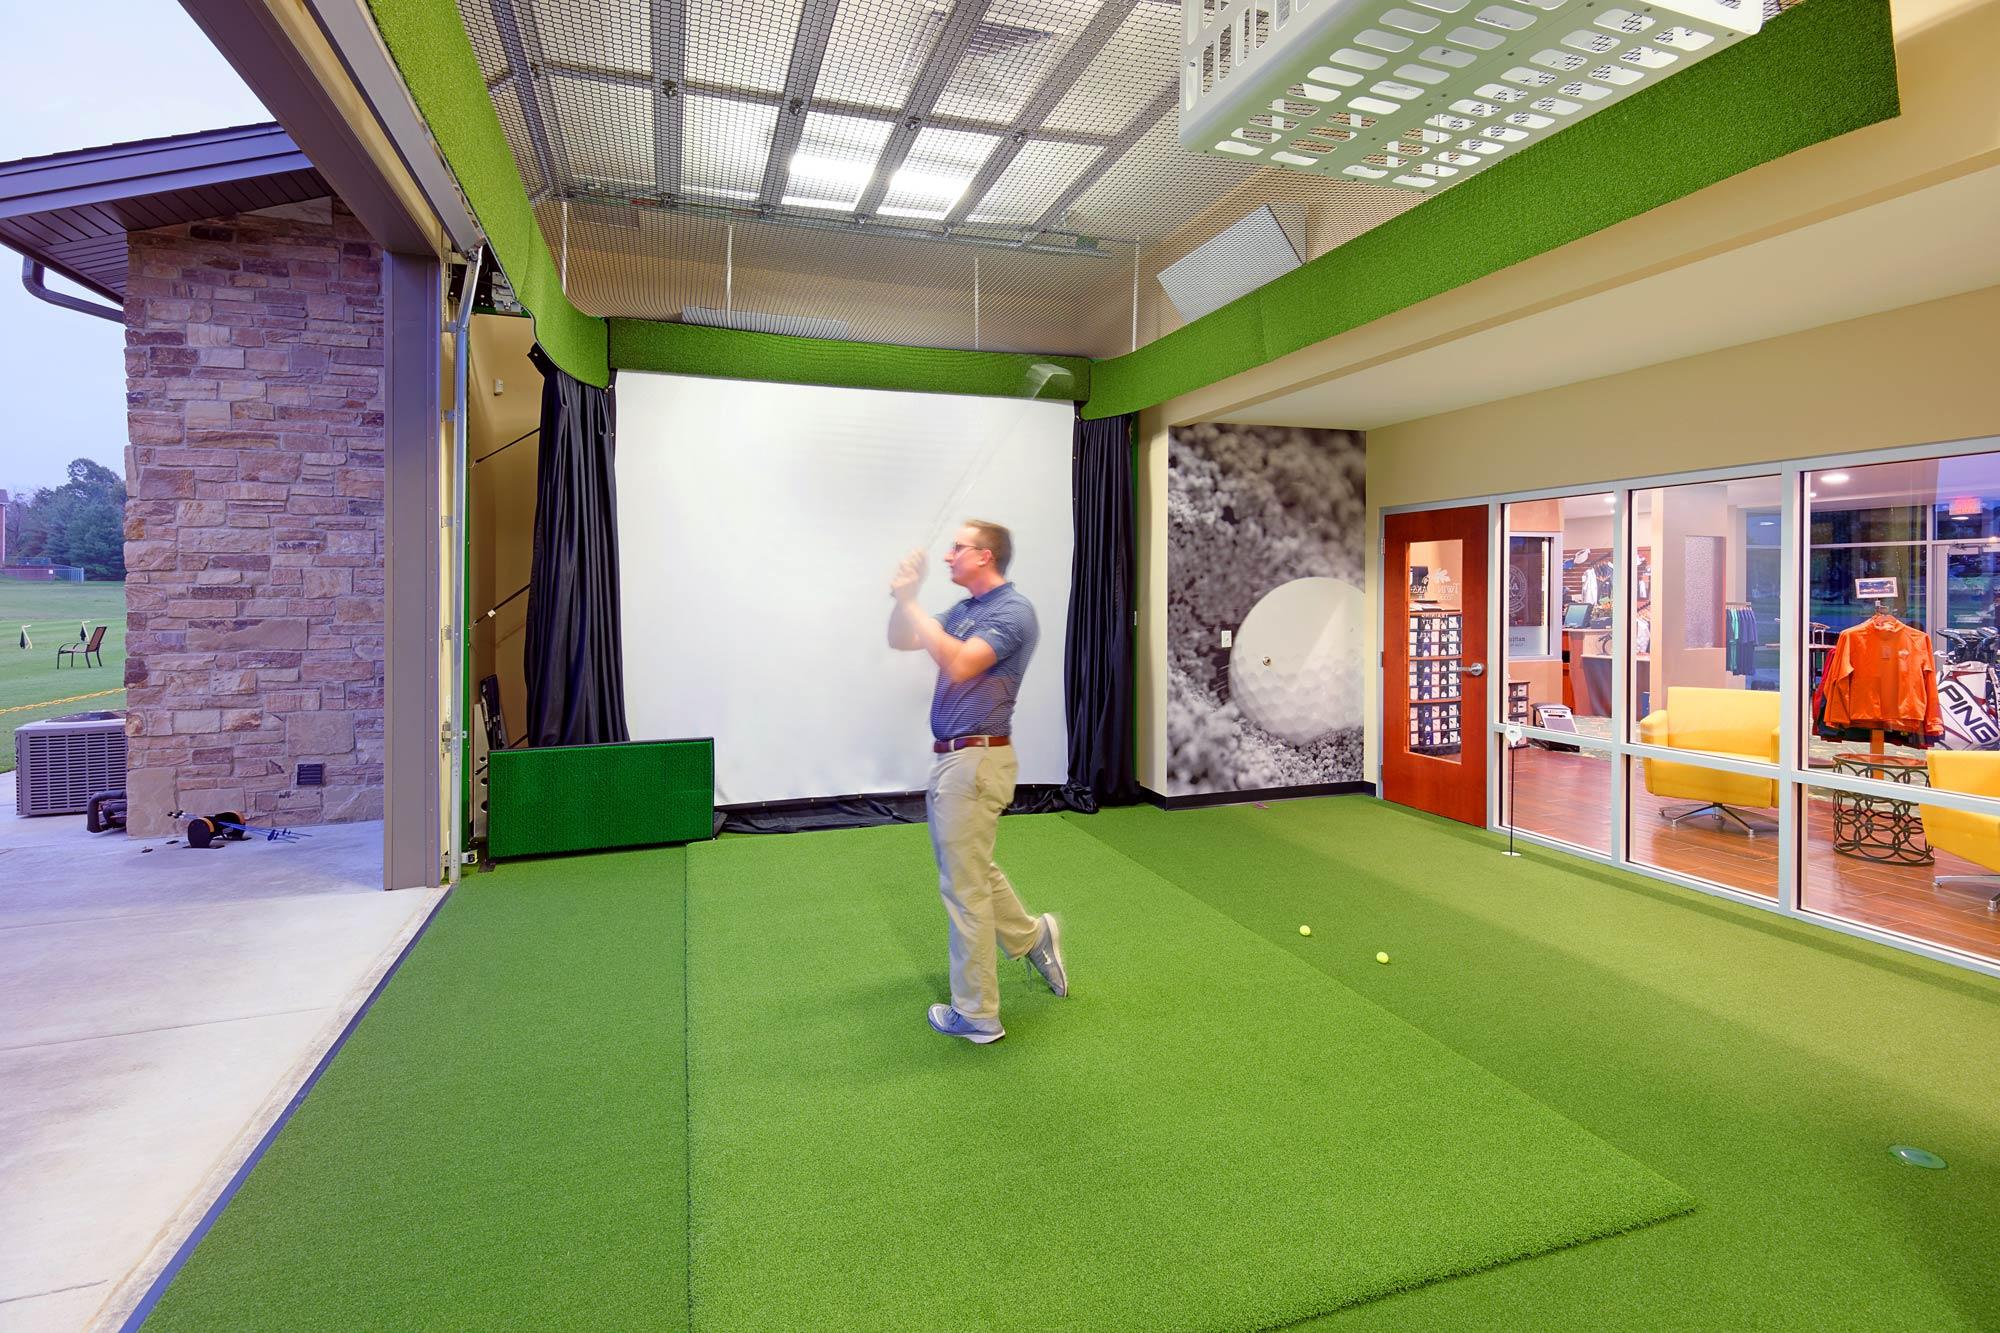 Twin-Oaks-Golf-Pro-Shop-H-Design-Interior-02.jpg